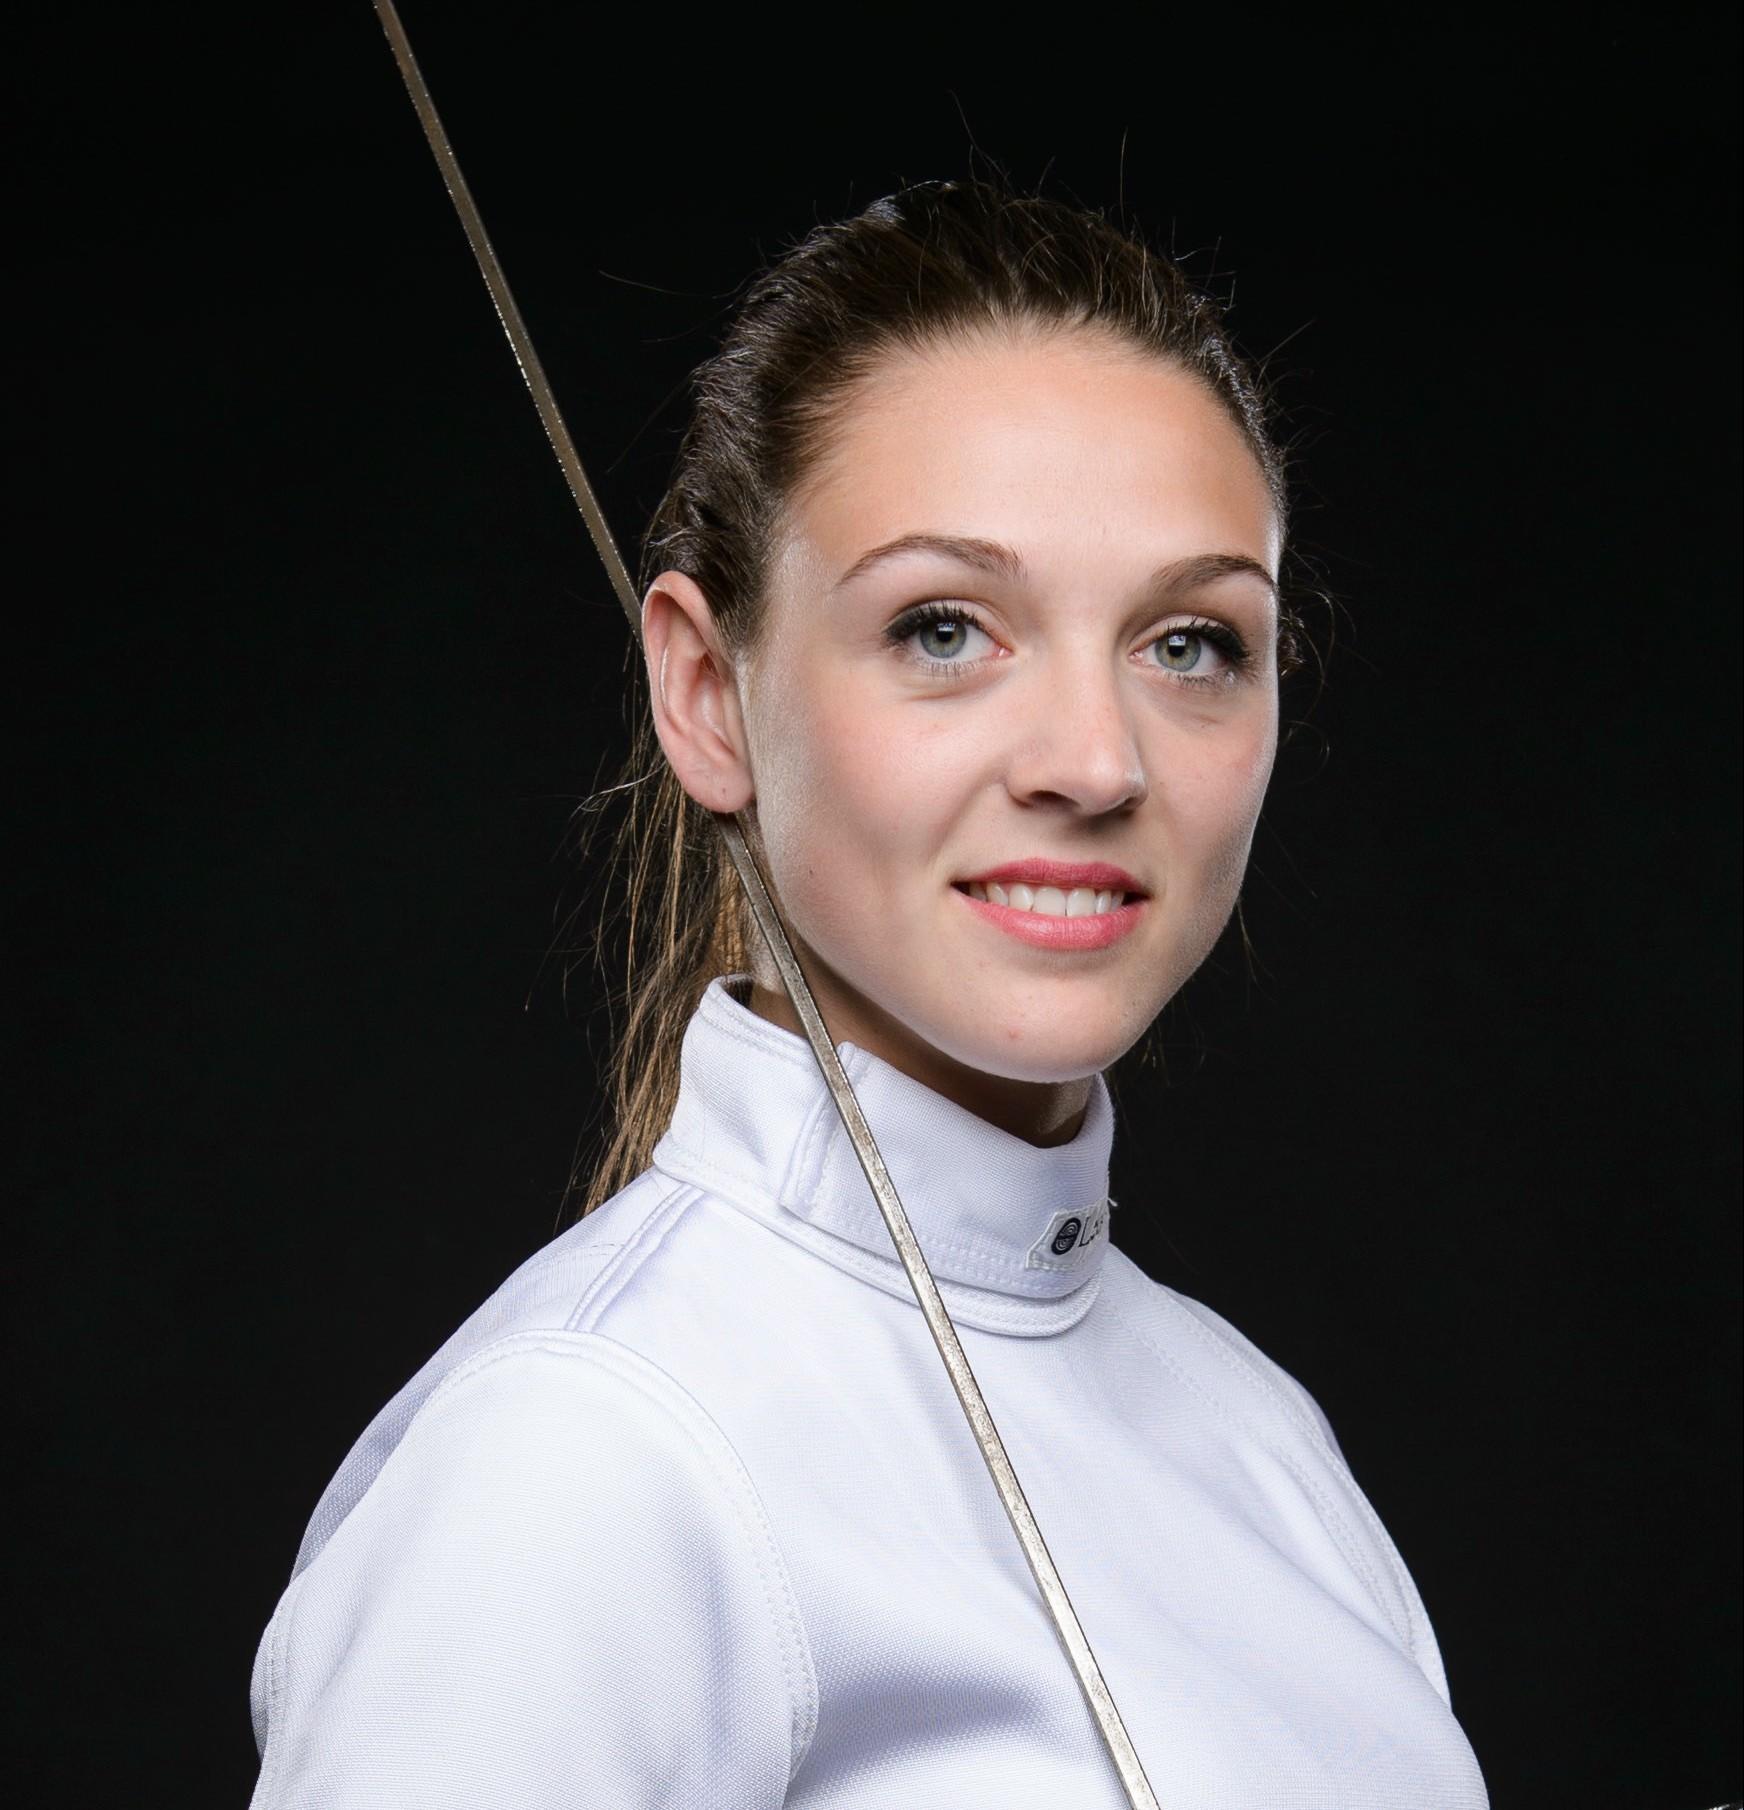 Manon Brunet